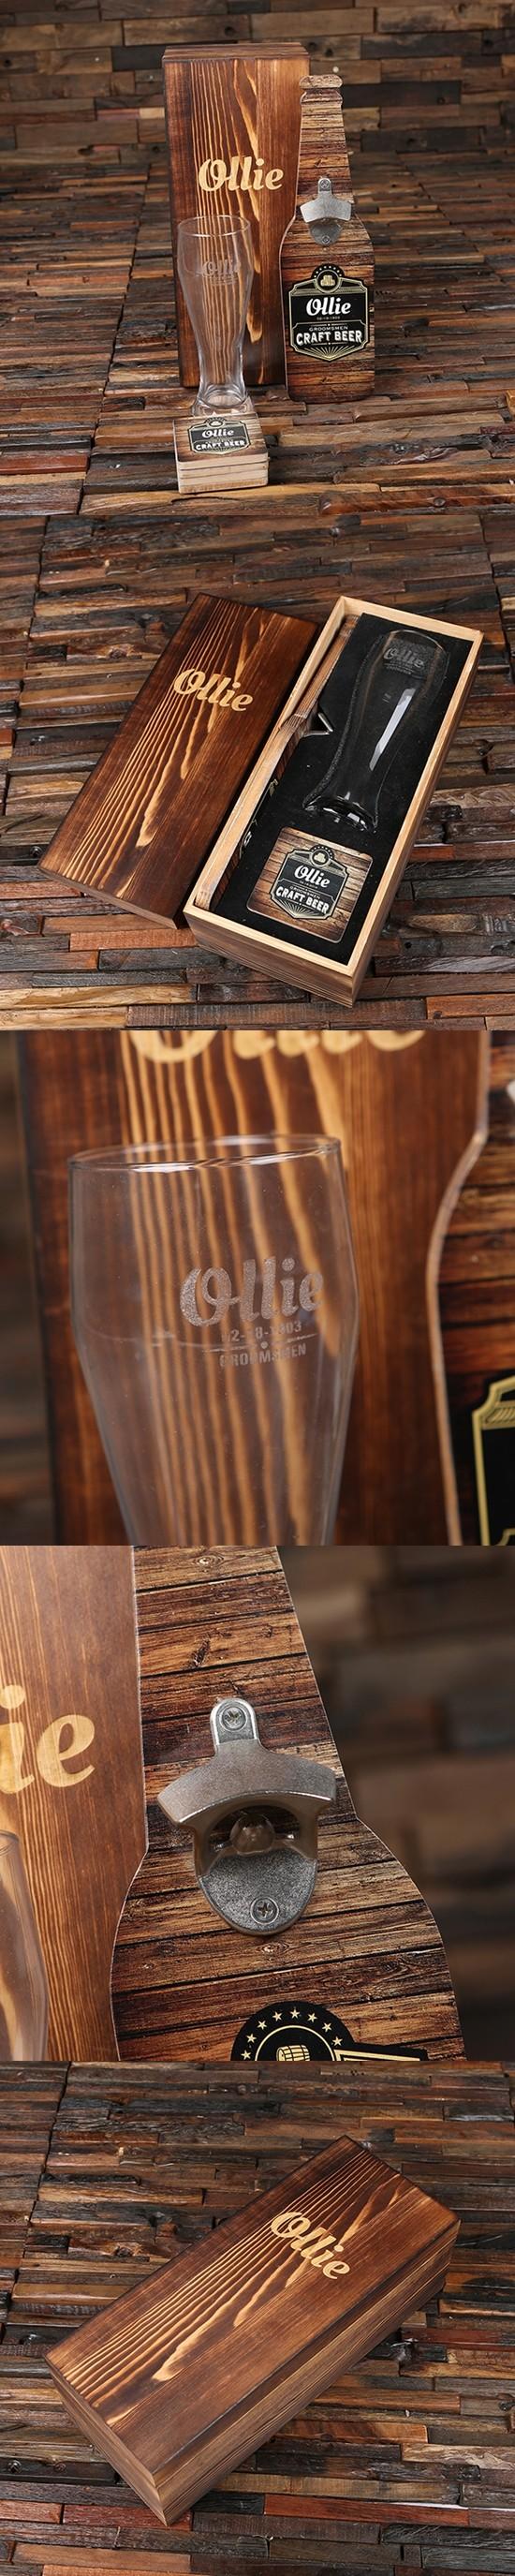 Black Label Wall Hang Bottle Opener, 4 Wood Coasters & Pilsner Glass